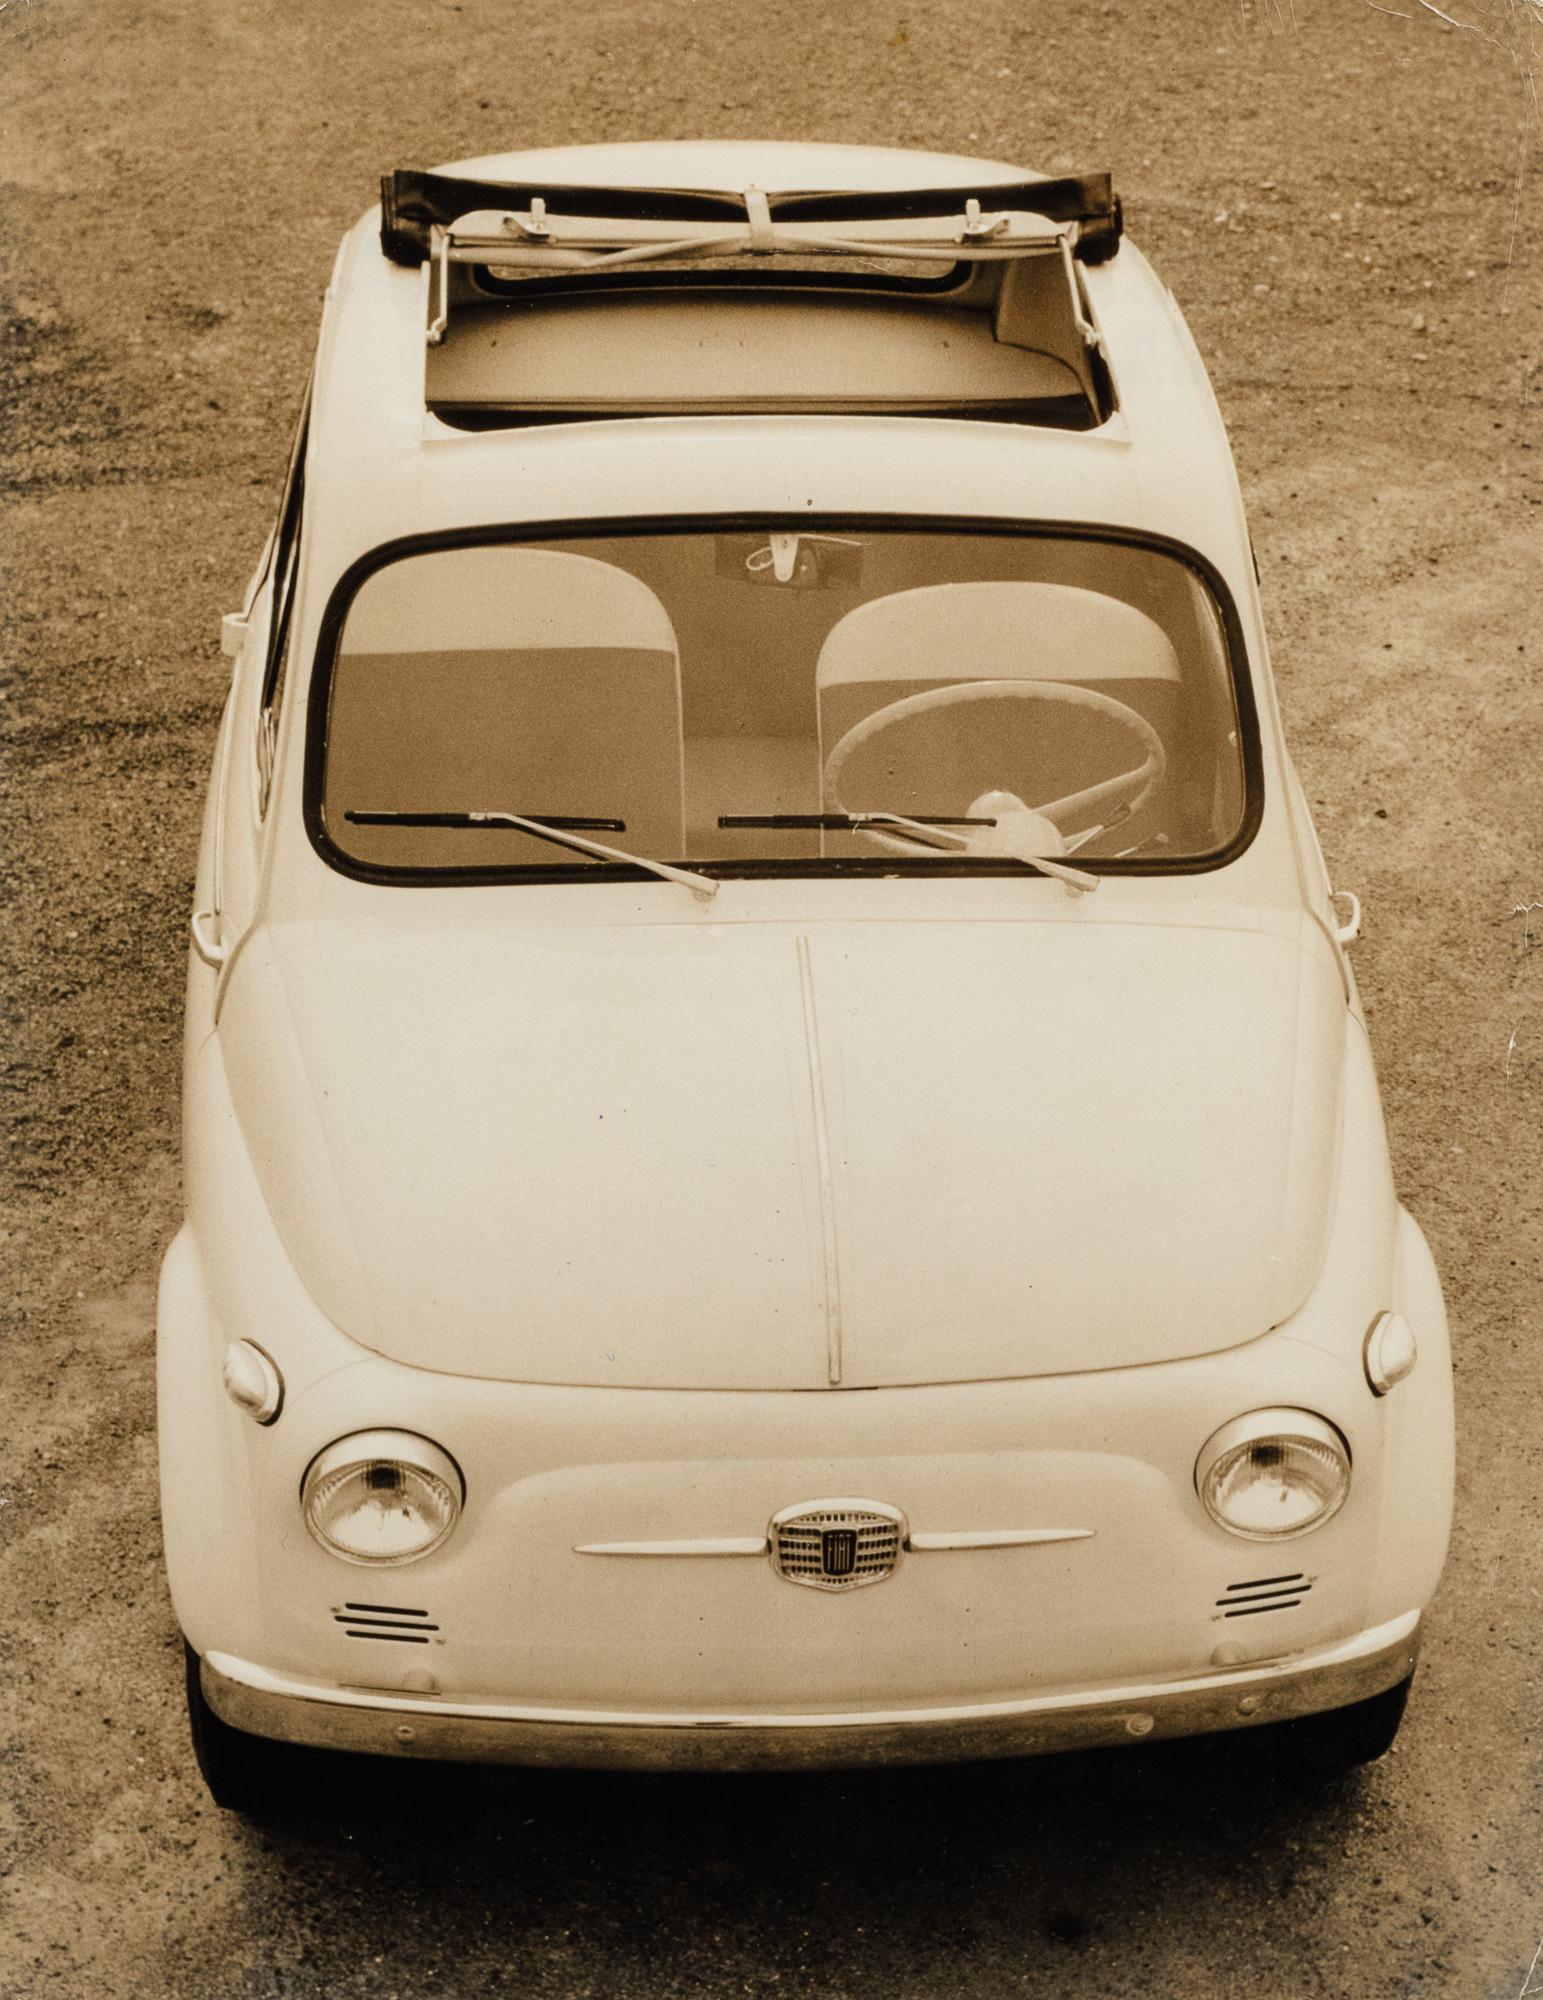 Foto di fabbriche di automobili